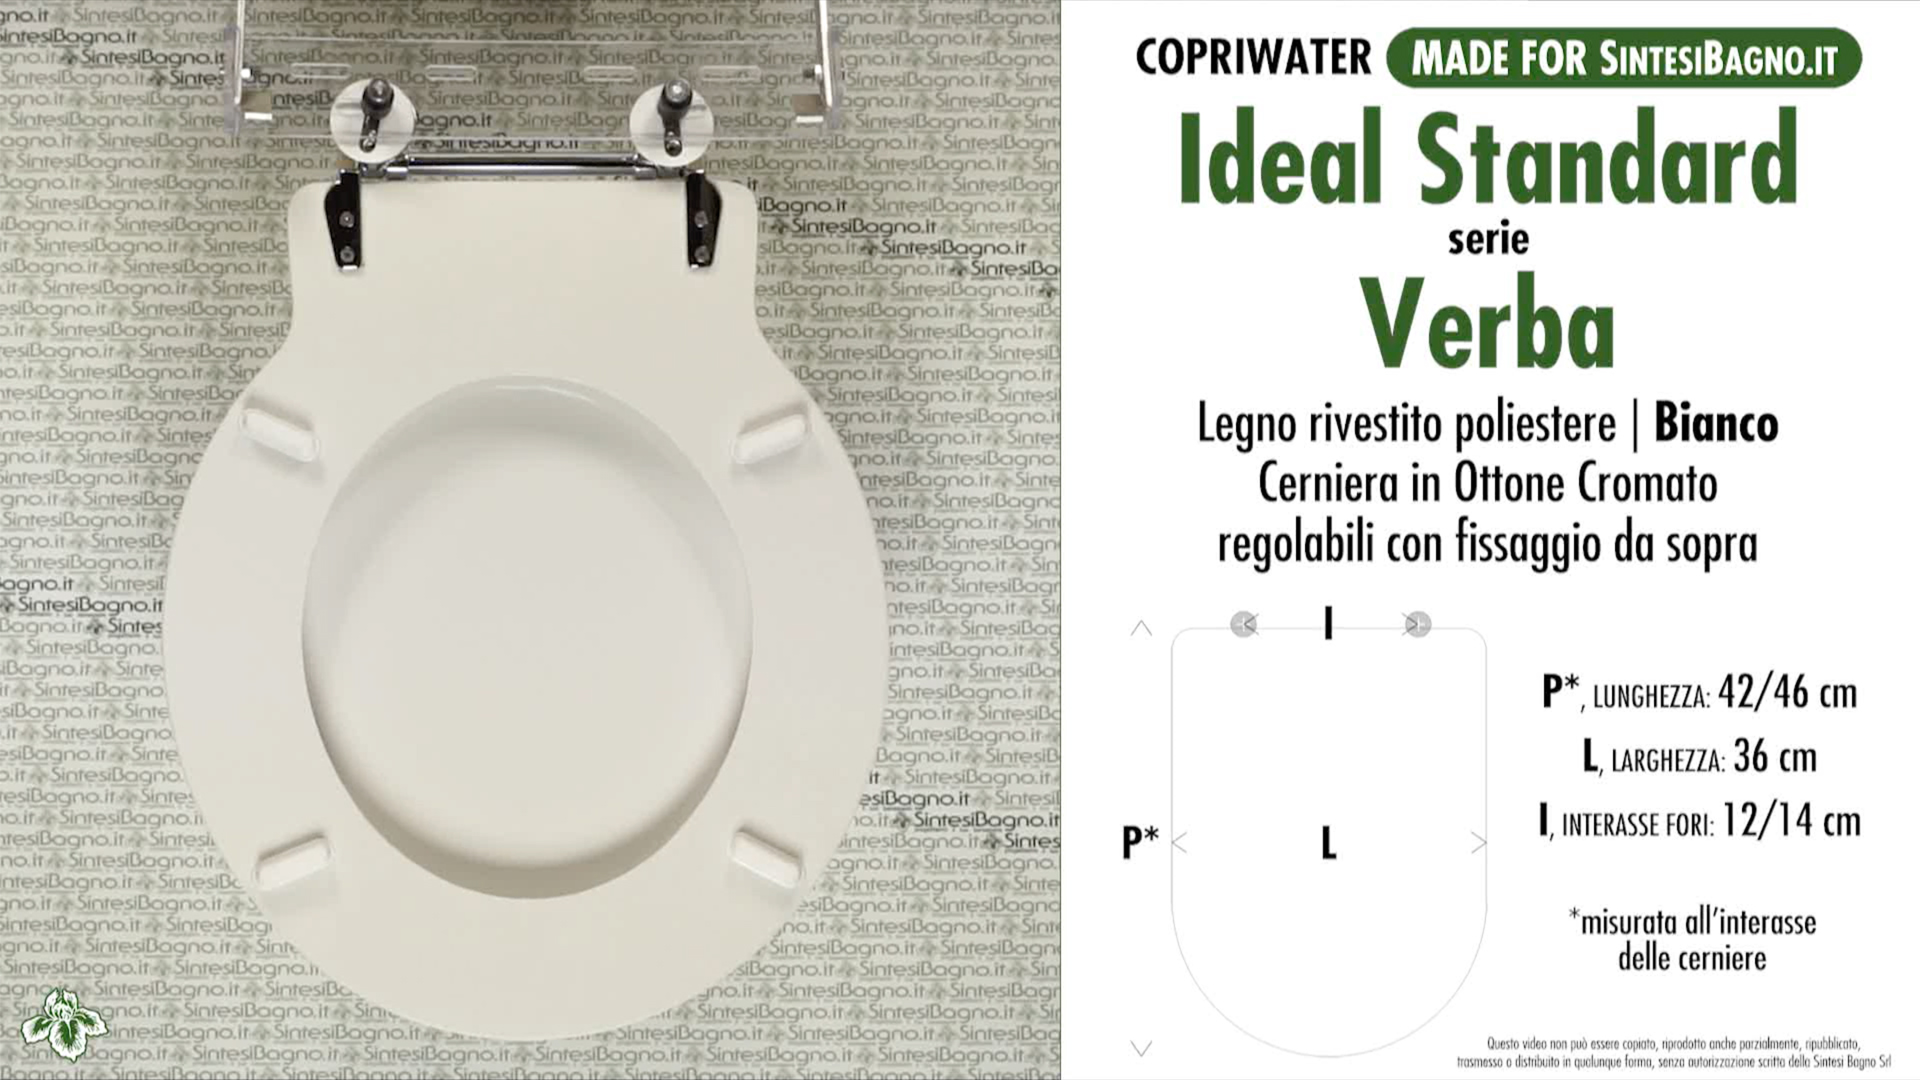 SCHEDA TECNICA MISURE copriwater IDEAL STANDARD VERBA